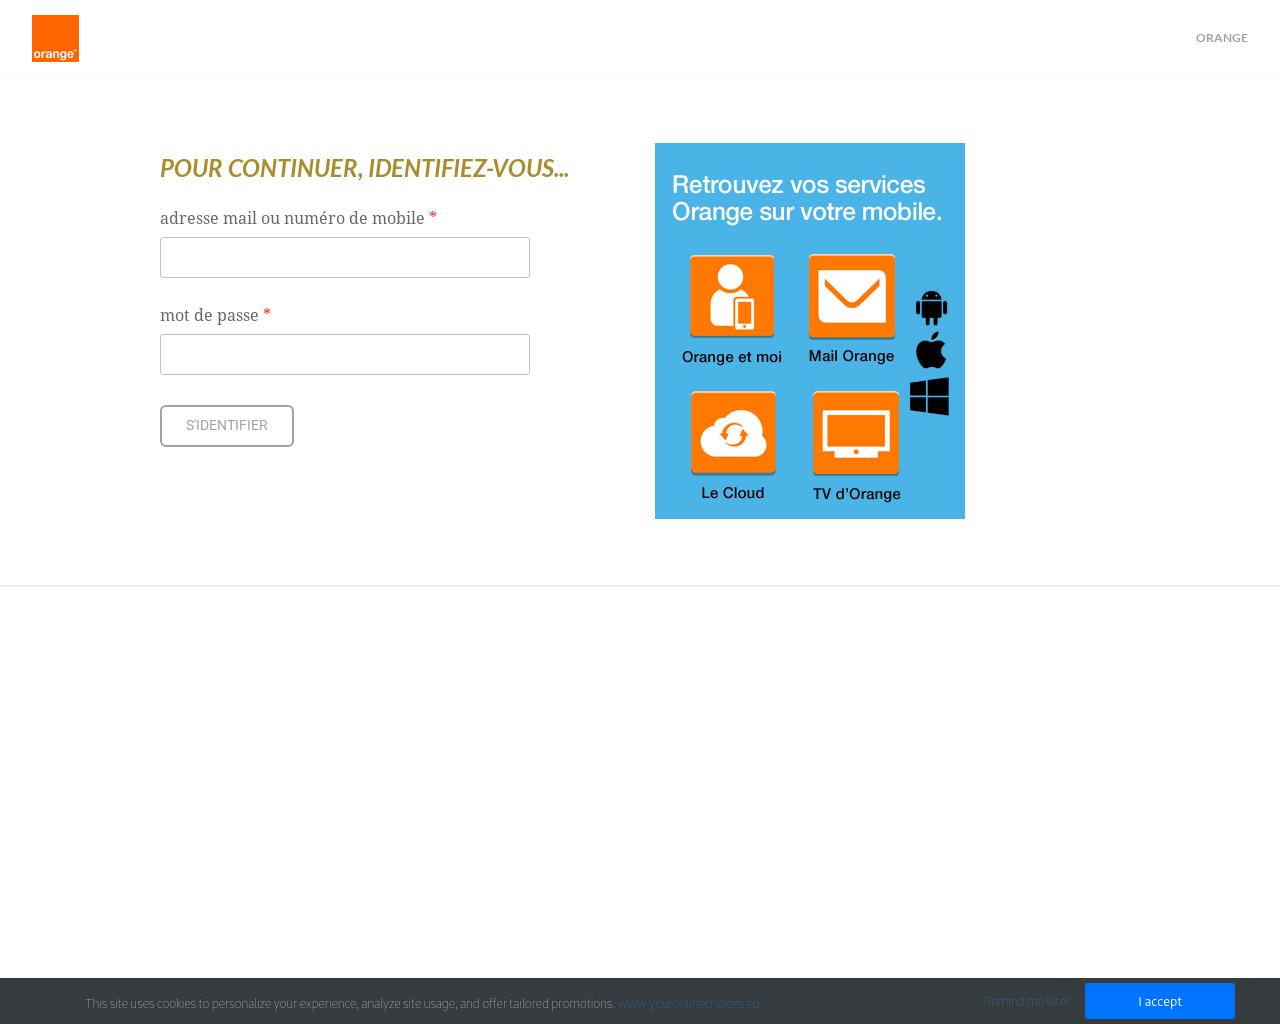 Orange-fr-screen-capture-1.png?t=1542014642464&width=600&name=orange-fr-screen-capture-1